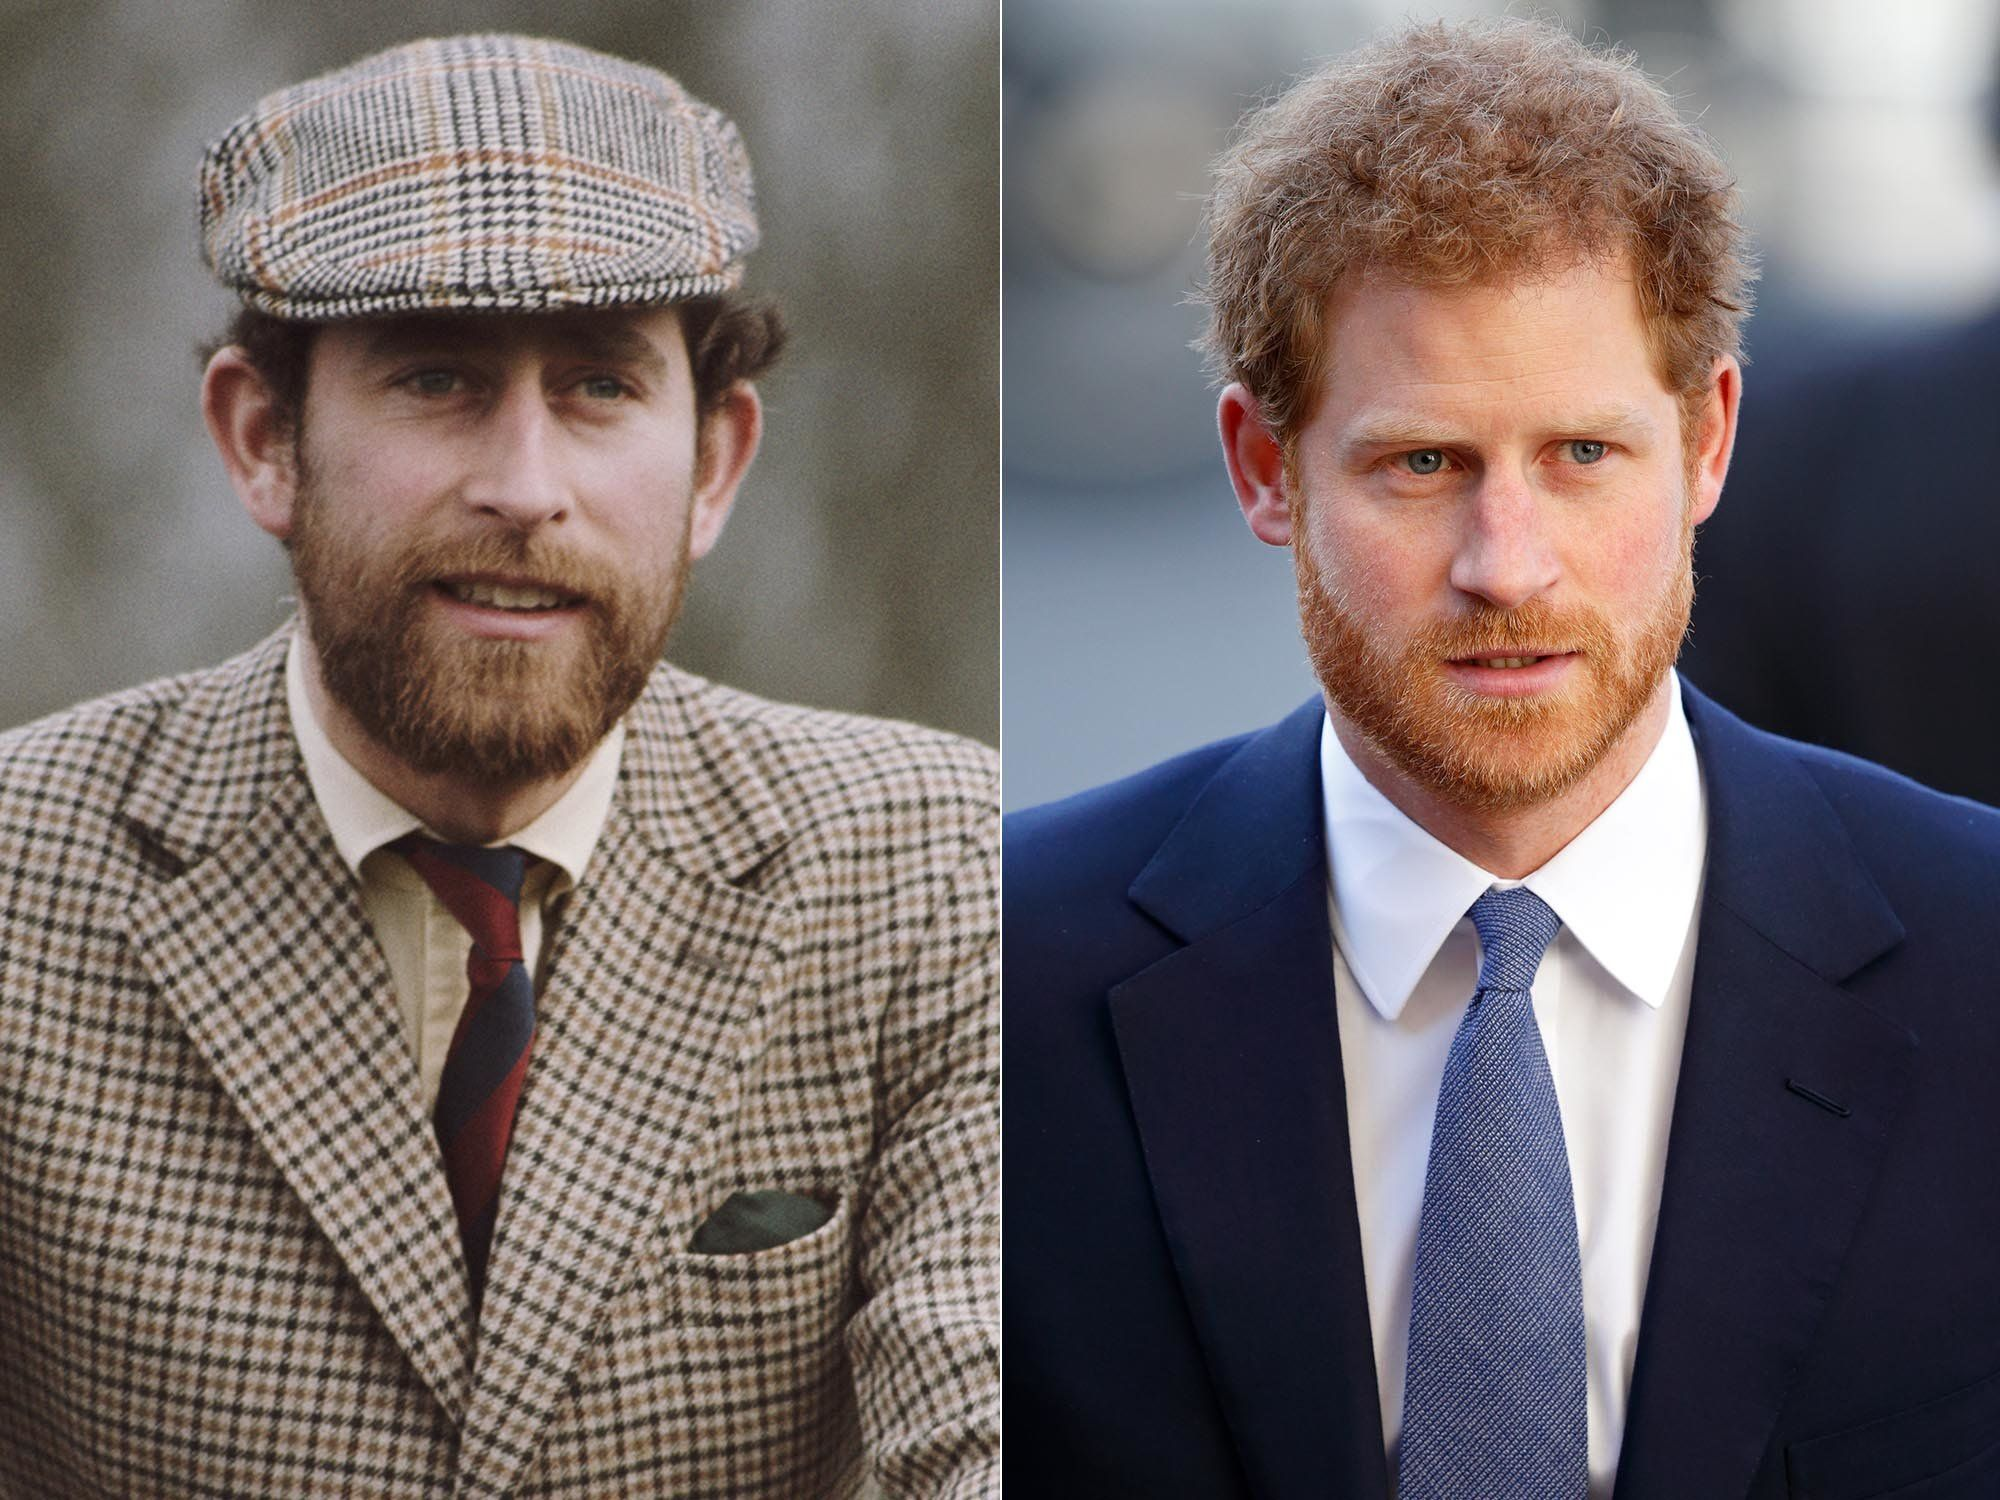 Foto yang menunjukkan kemiripan para bangsawan Inggris